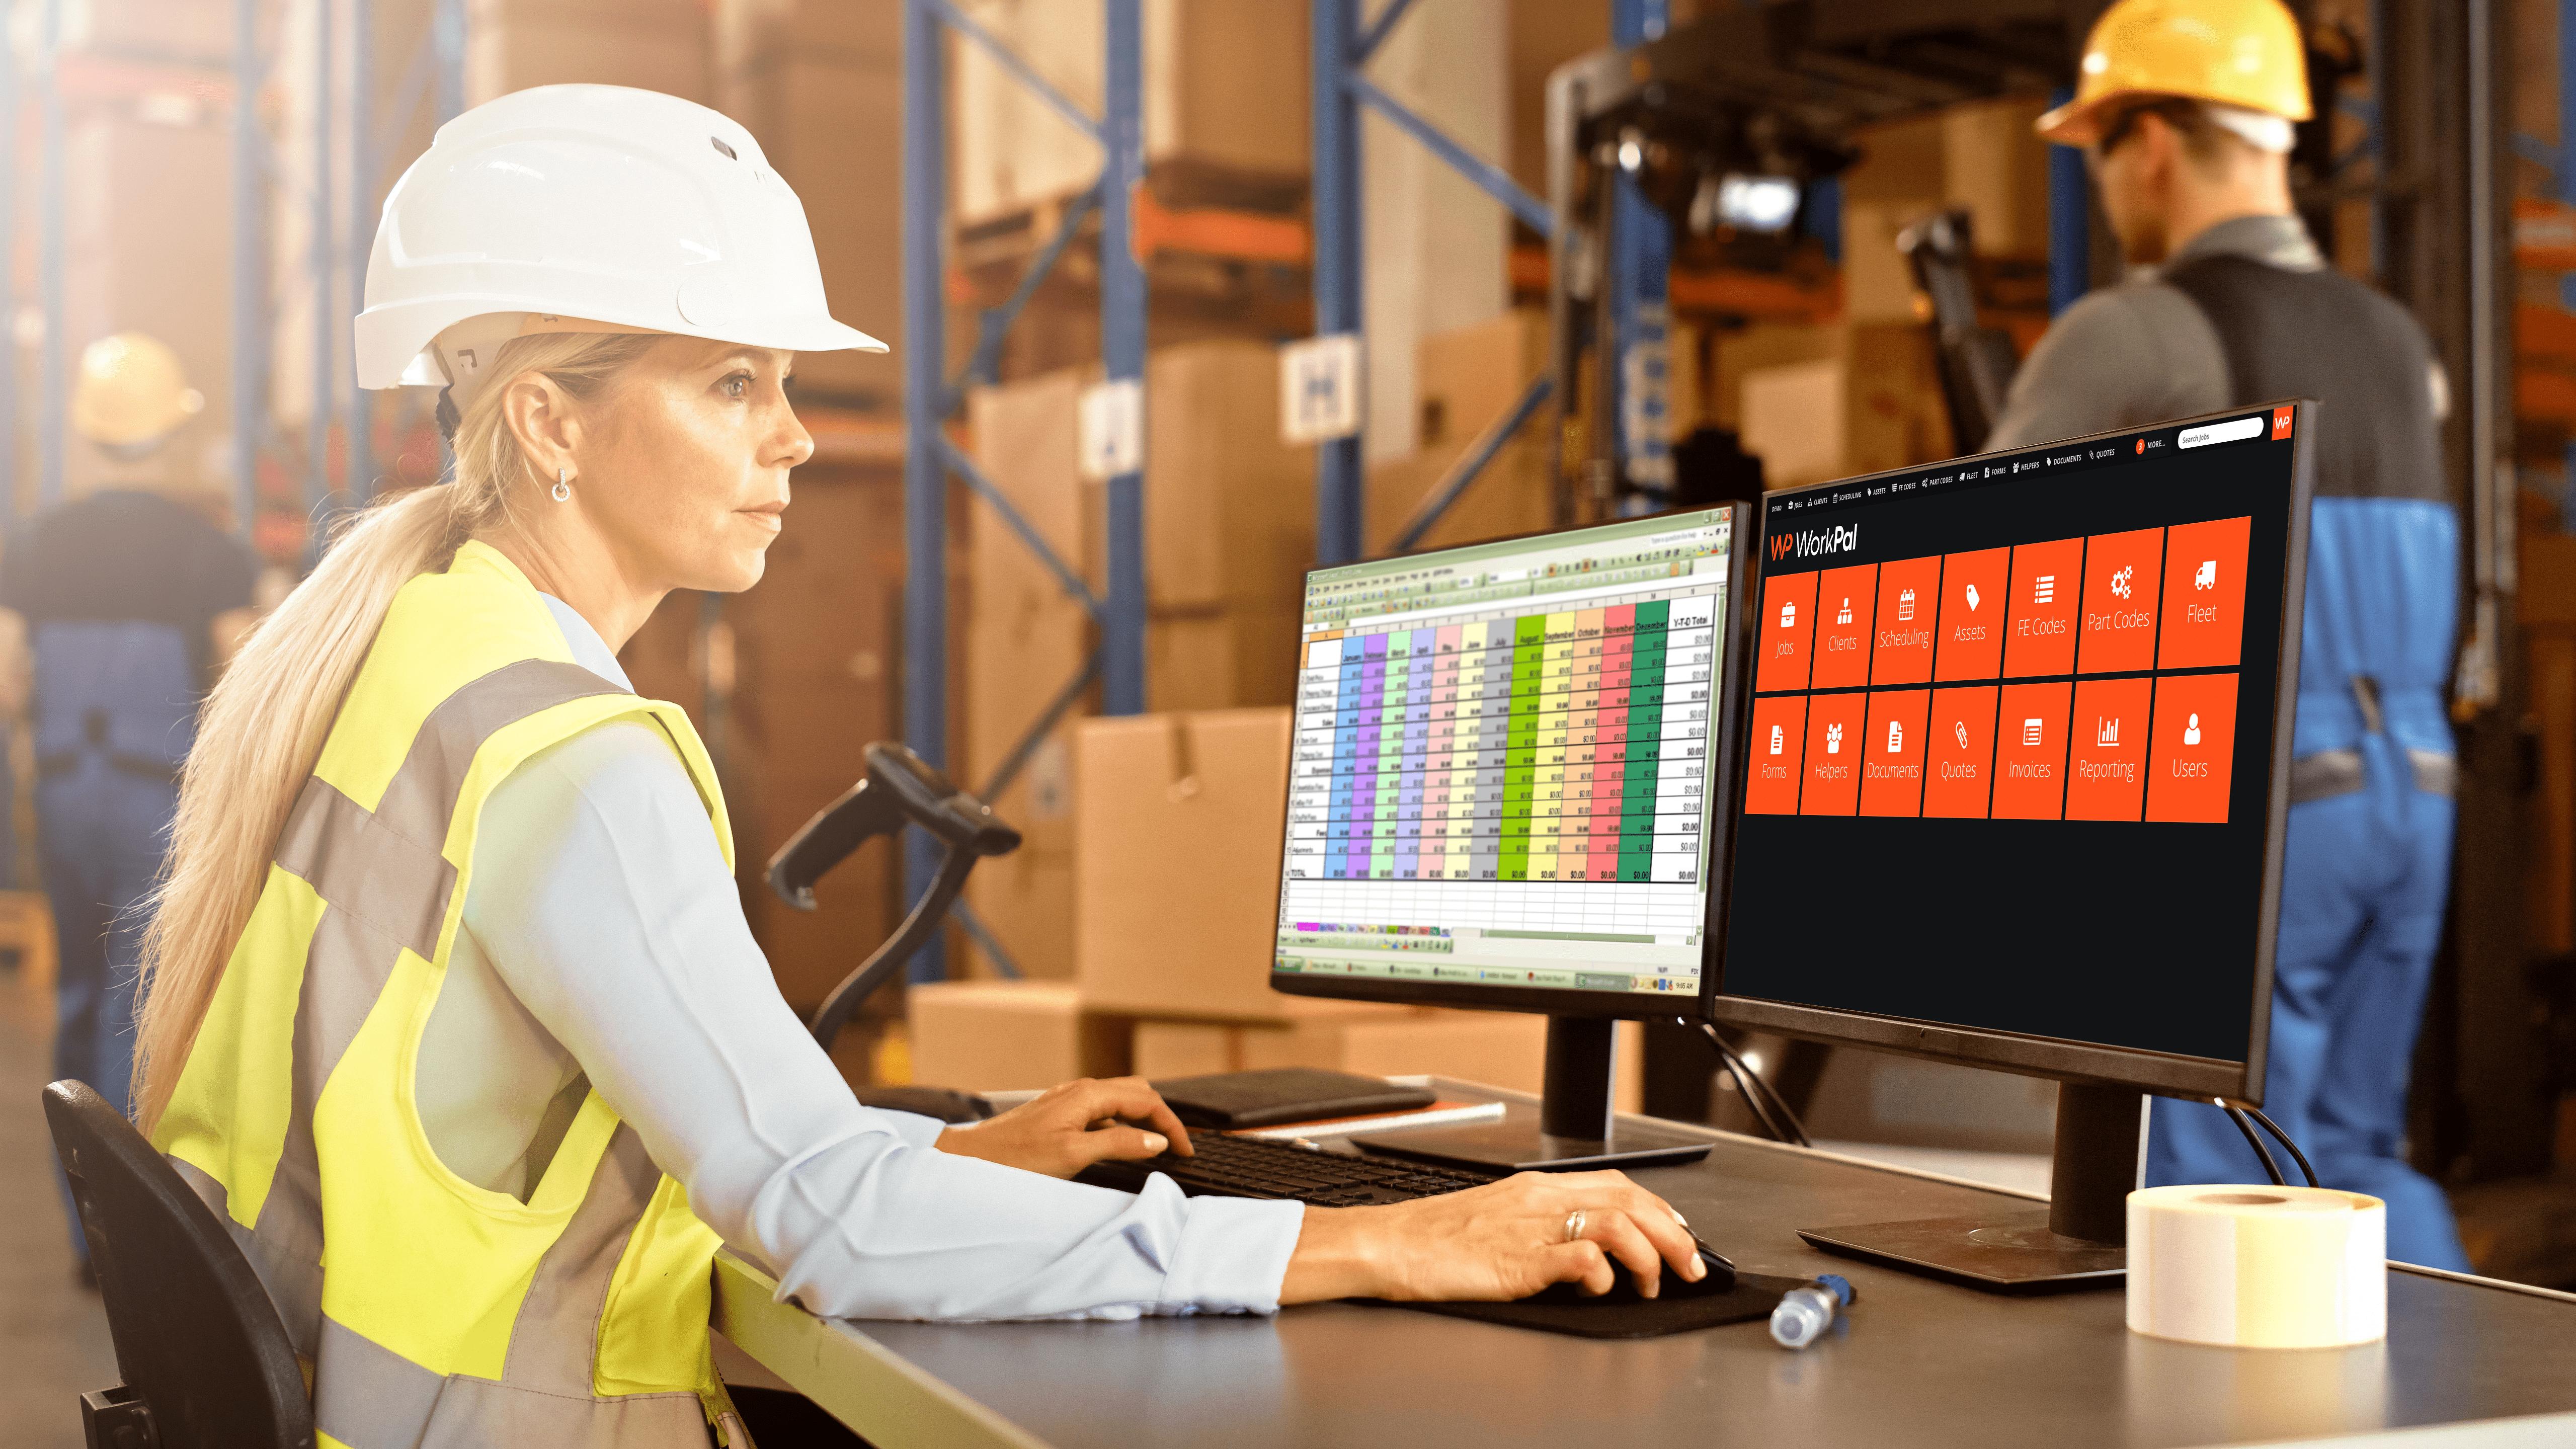 cloud-based field service software